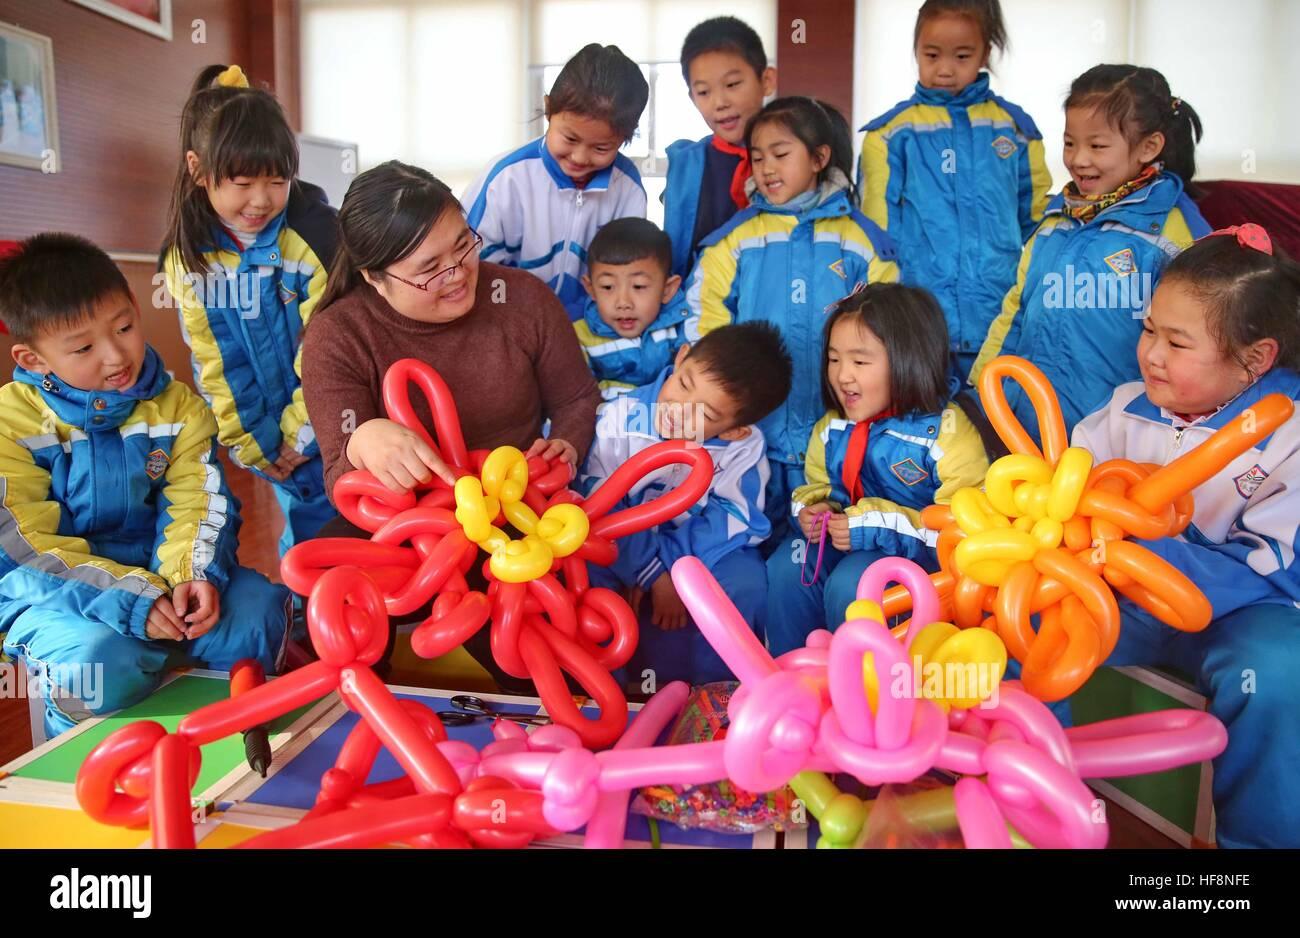 Decorazioni Torte Cinesi : Nodi cinesi immagini nodi cinesi fotos stock alamy